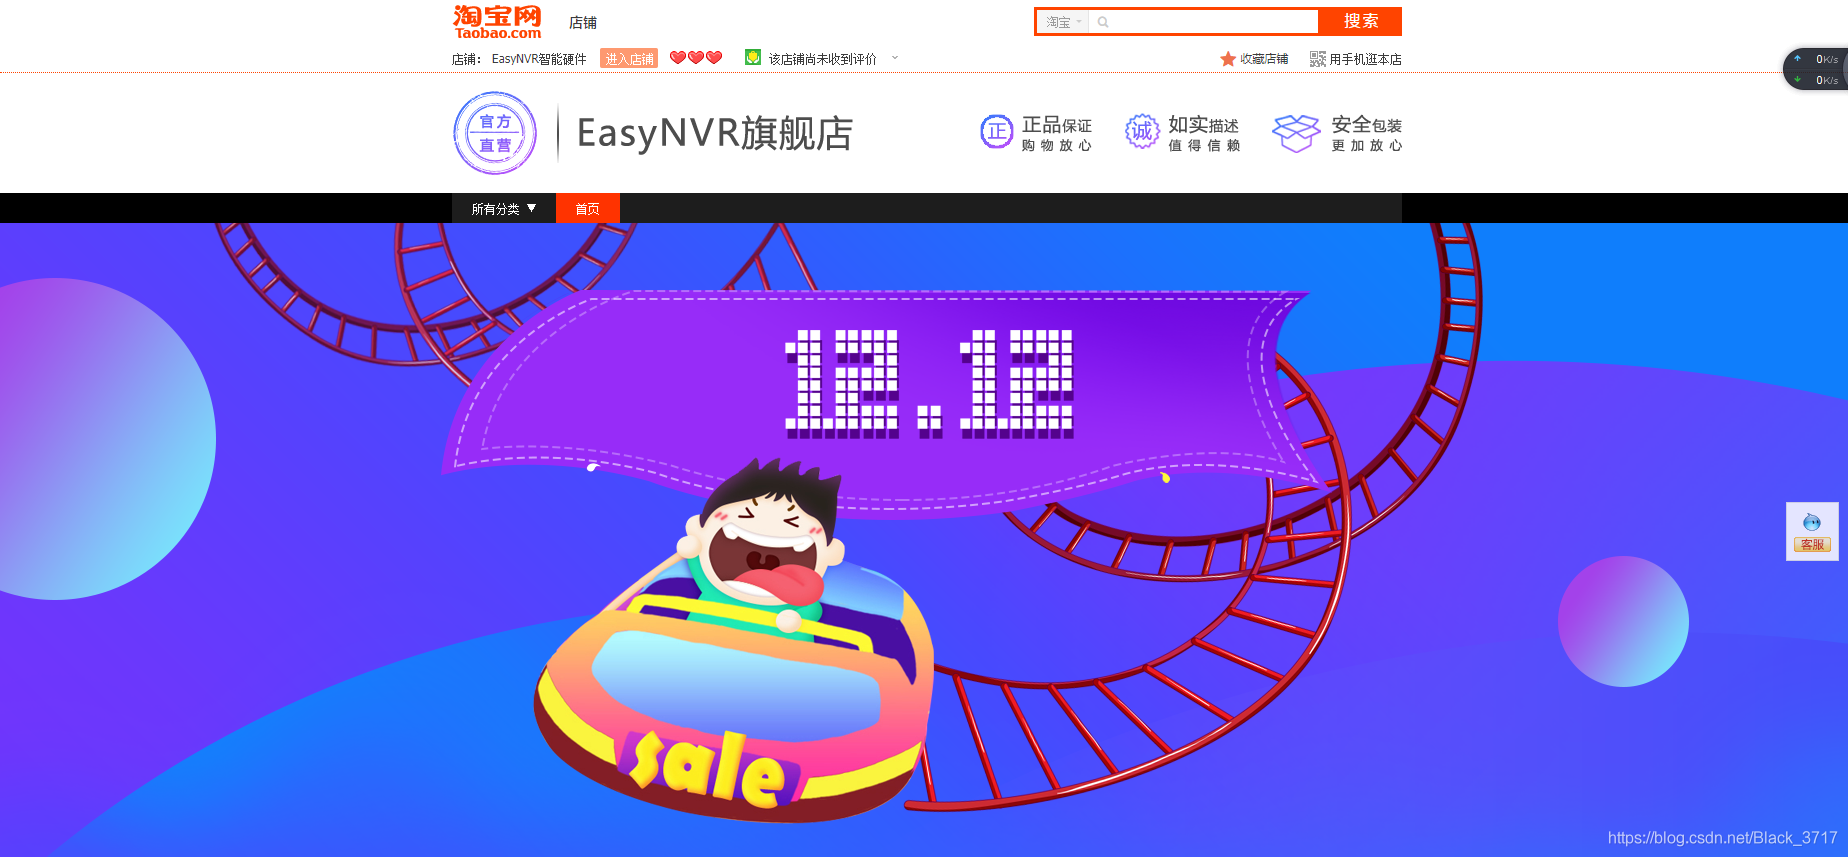 EasyNVR软硬一体